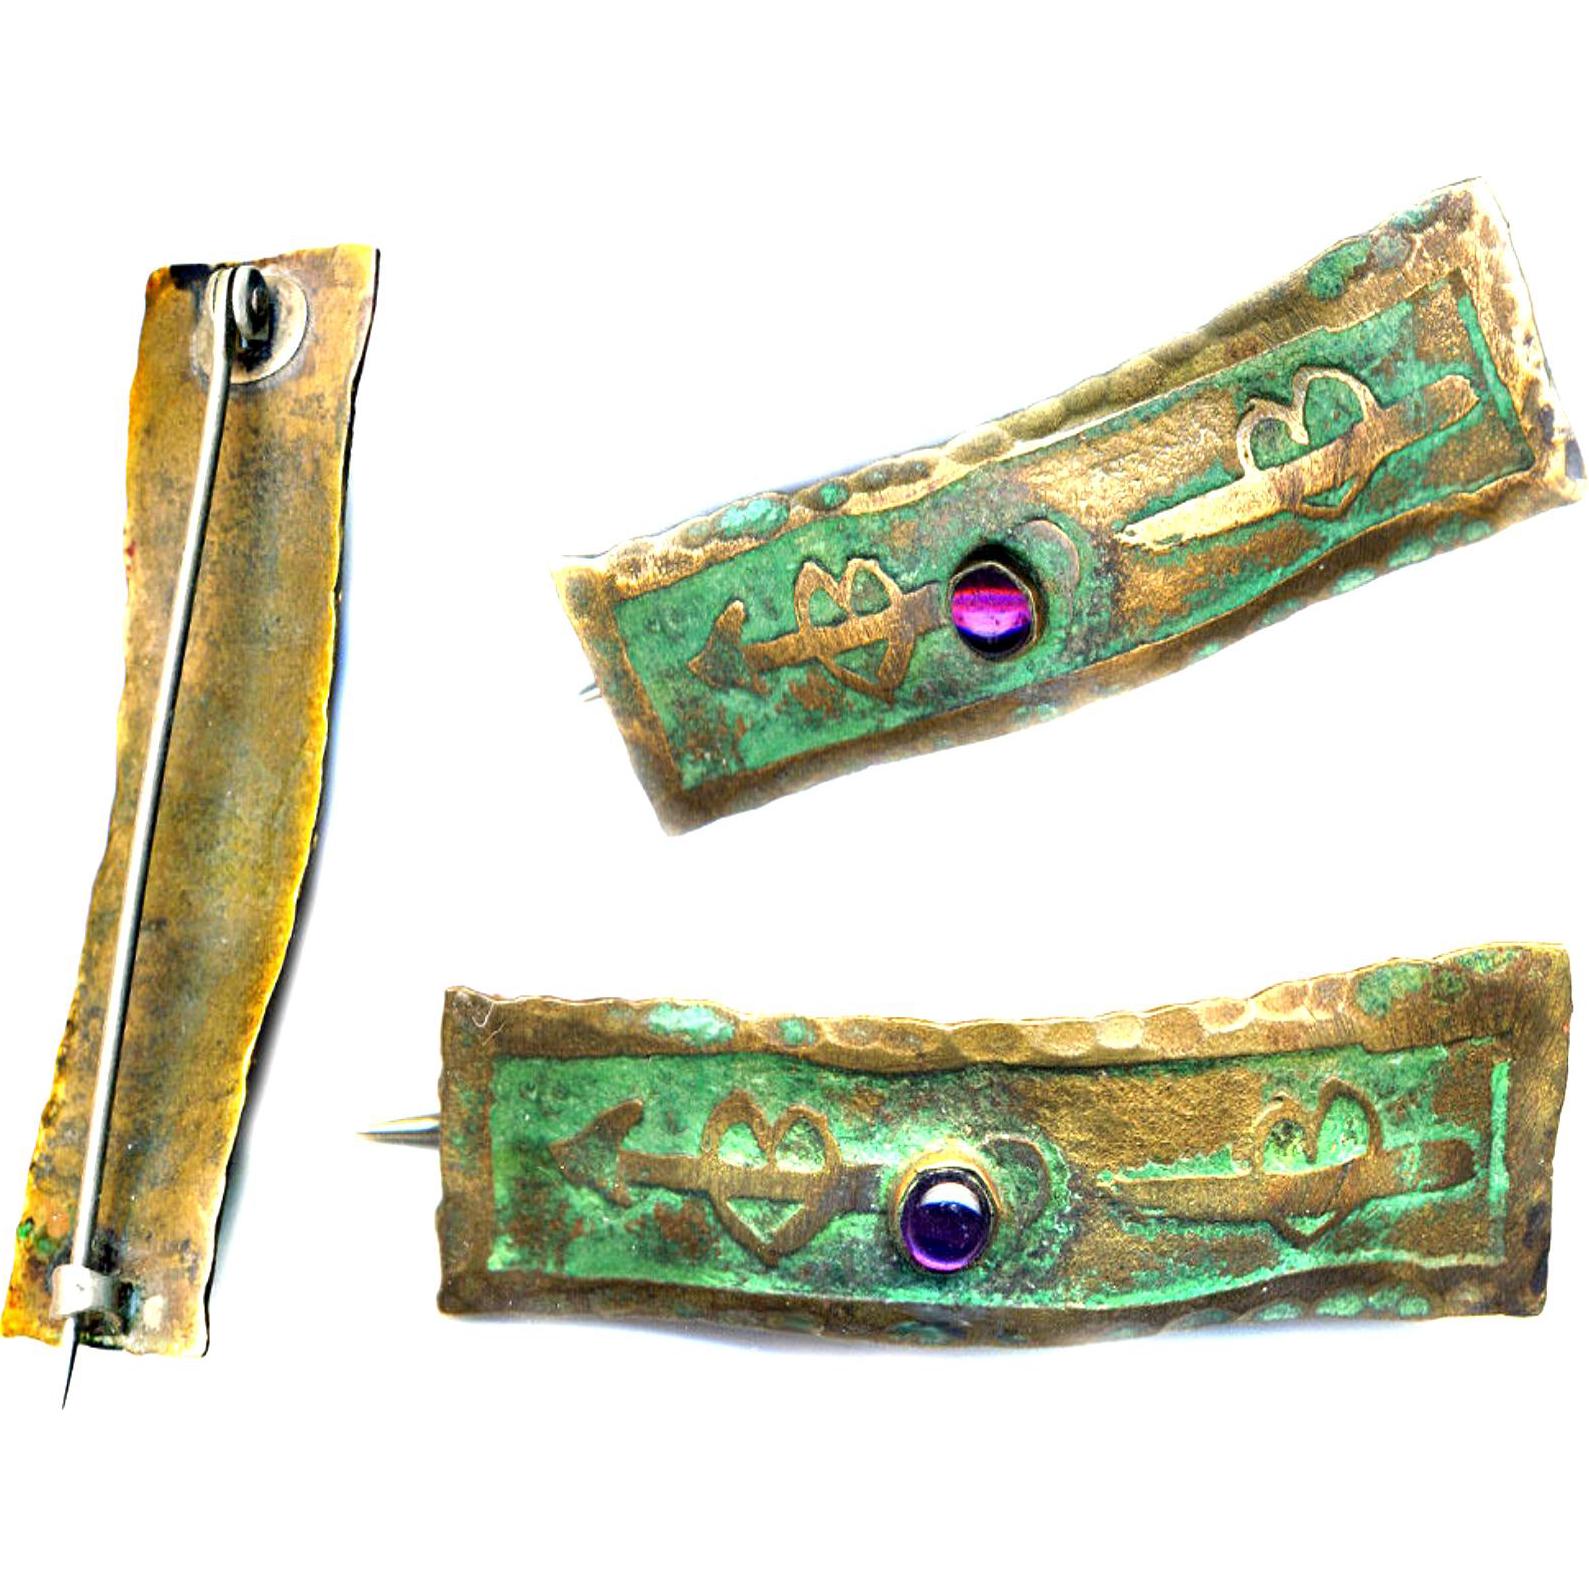 Brooch--ONE Western NY Arts & Crafts Wavy Verdigris Brass & Amethyst Bar Pin